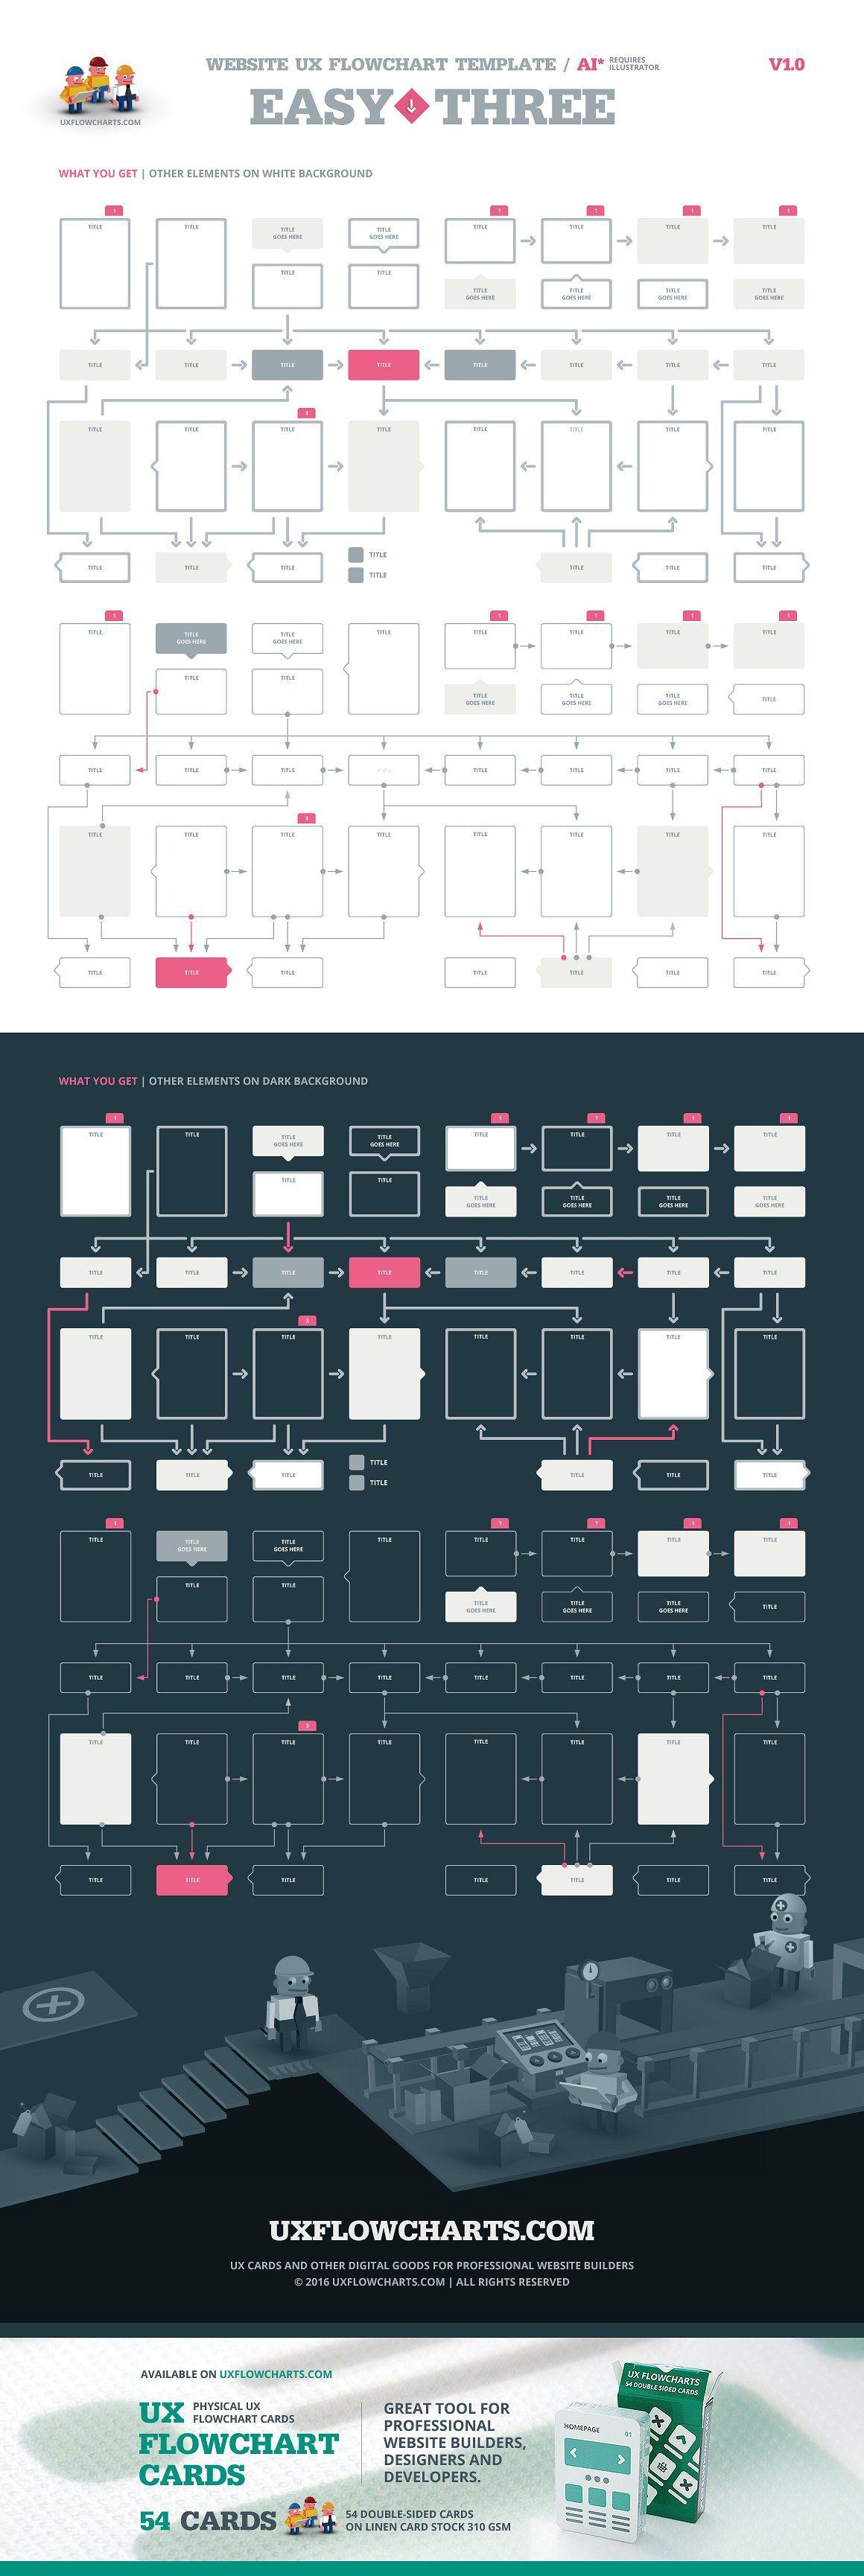 EasyThree Website UX Flowchart AI Addeditpointplanning